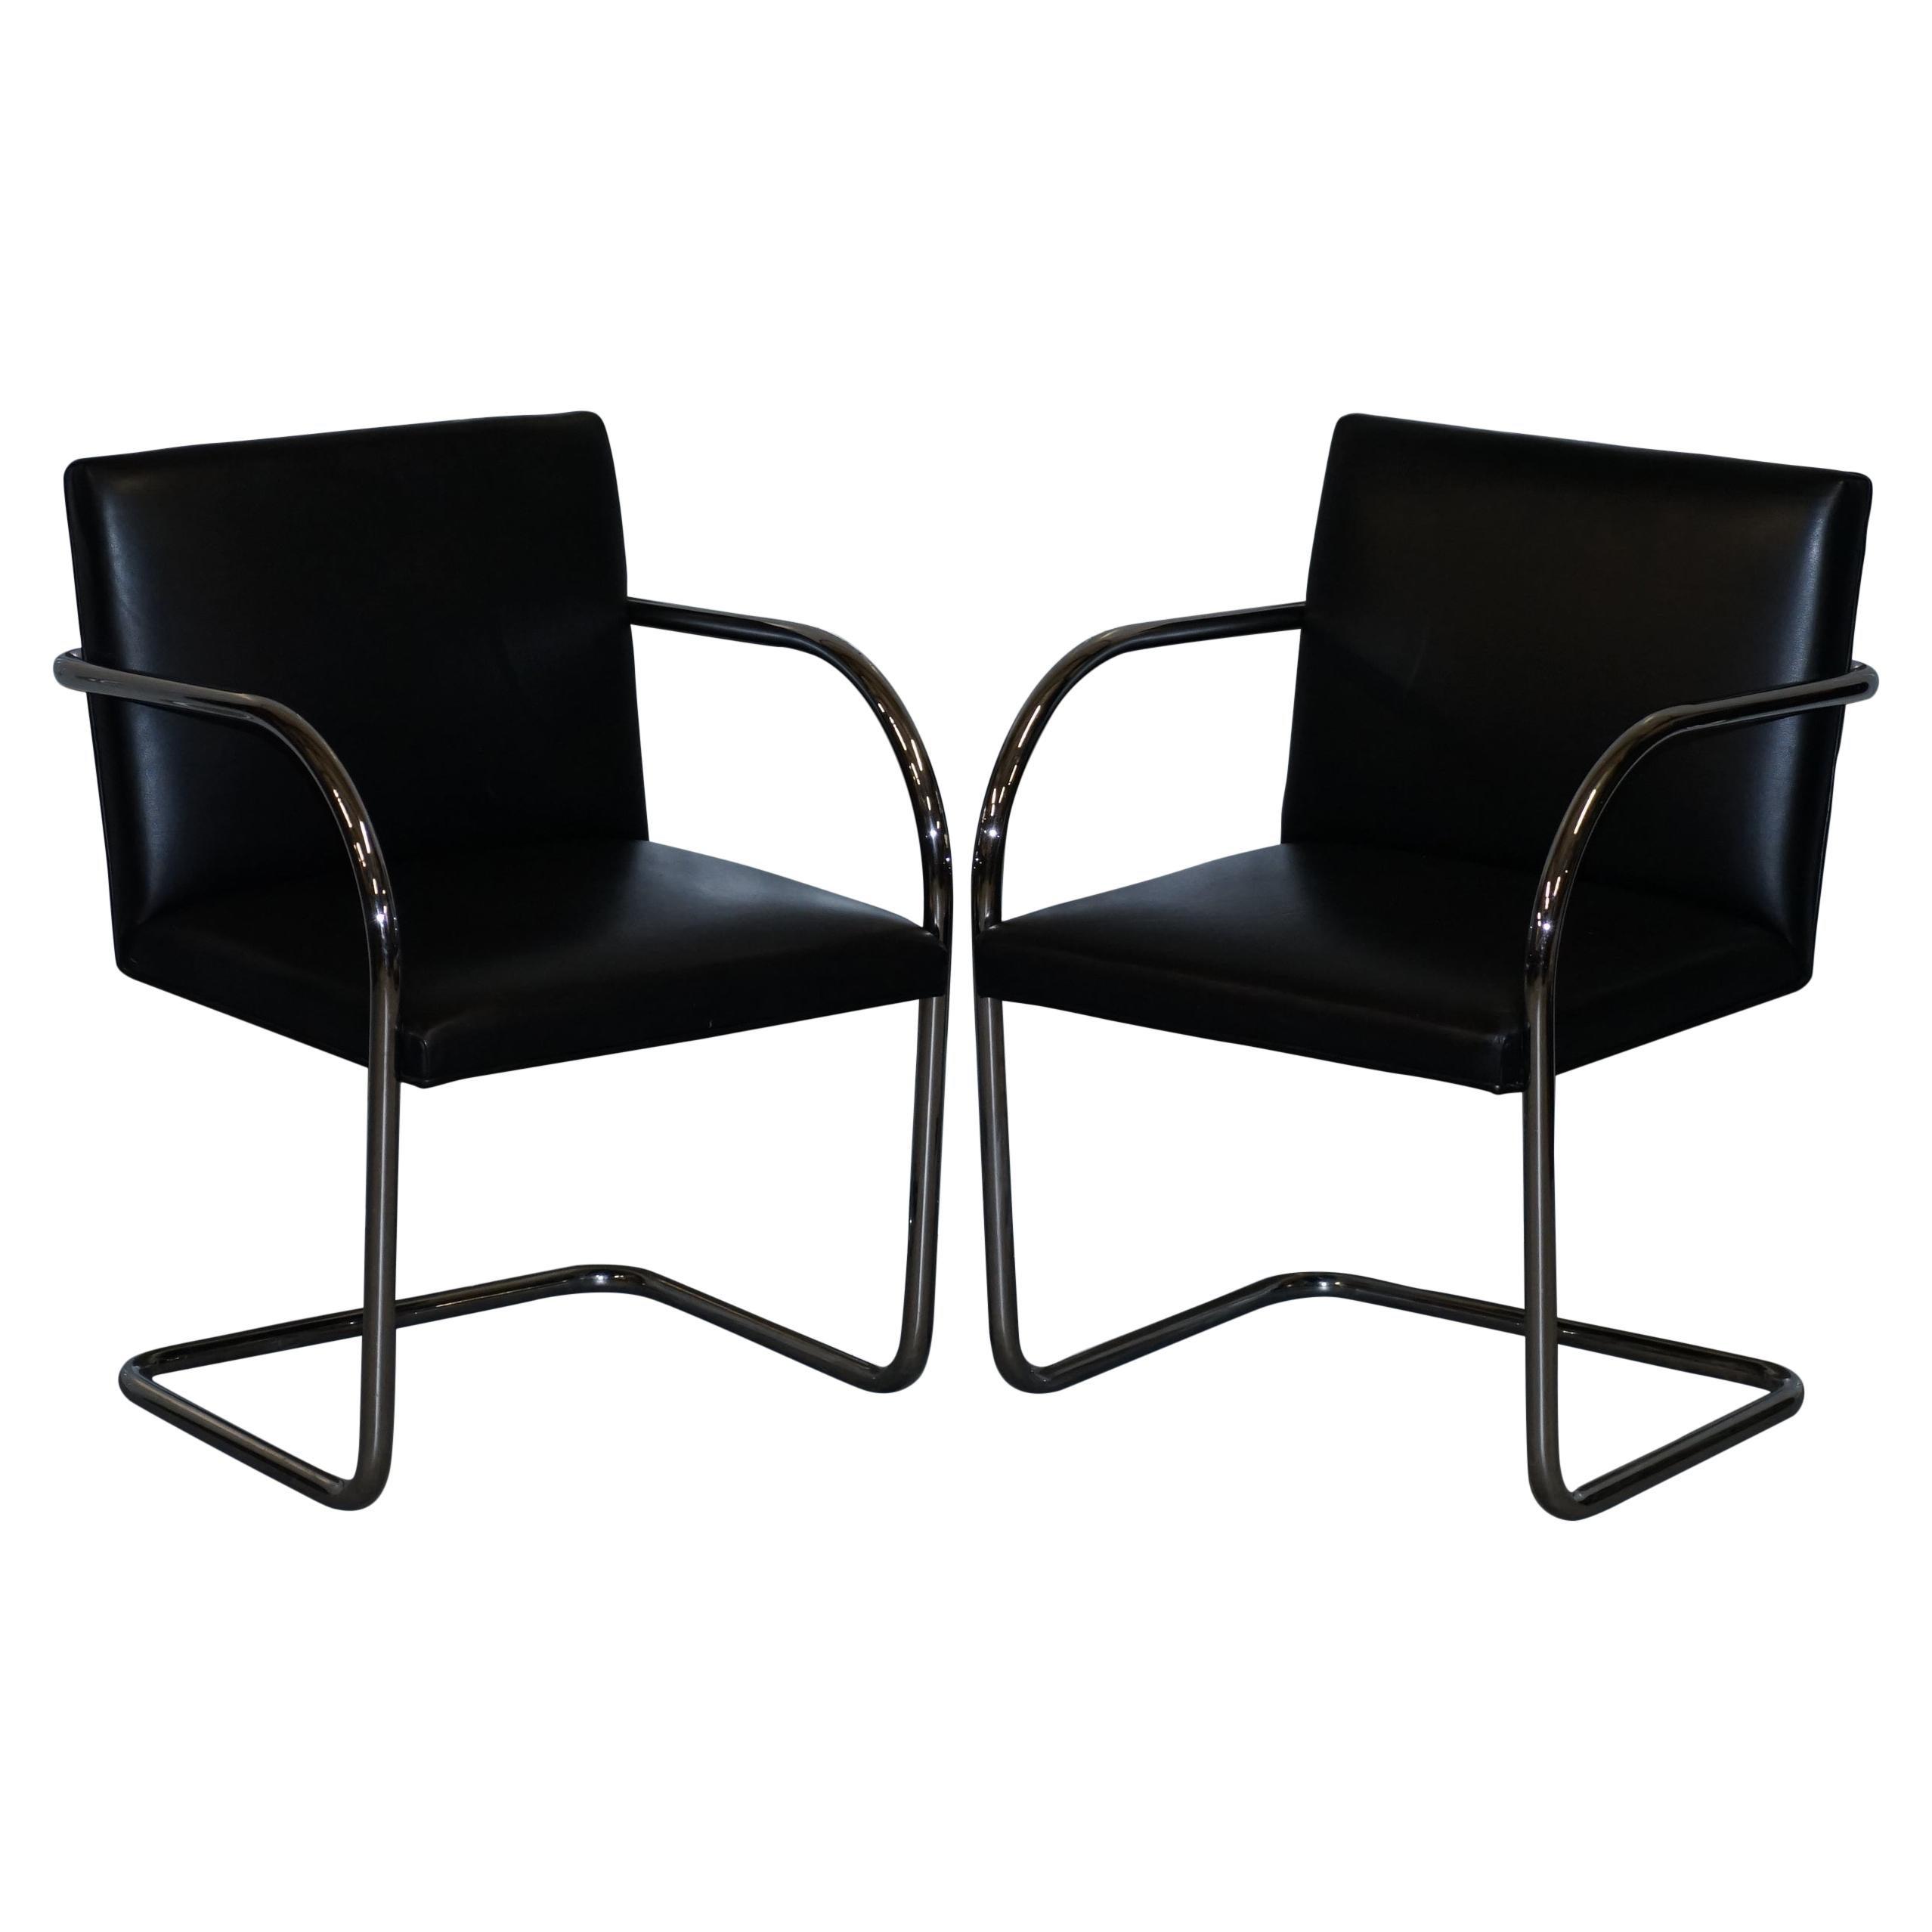 Pair of Original Vintage Black Leather & Chrome Walter Knoll Brno Armchairs